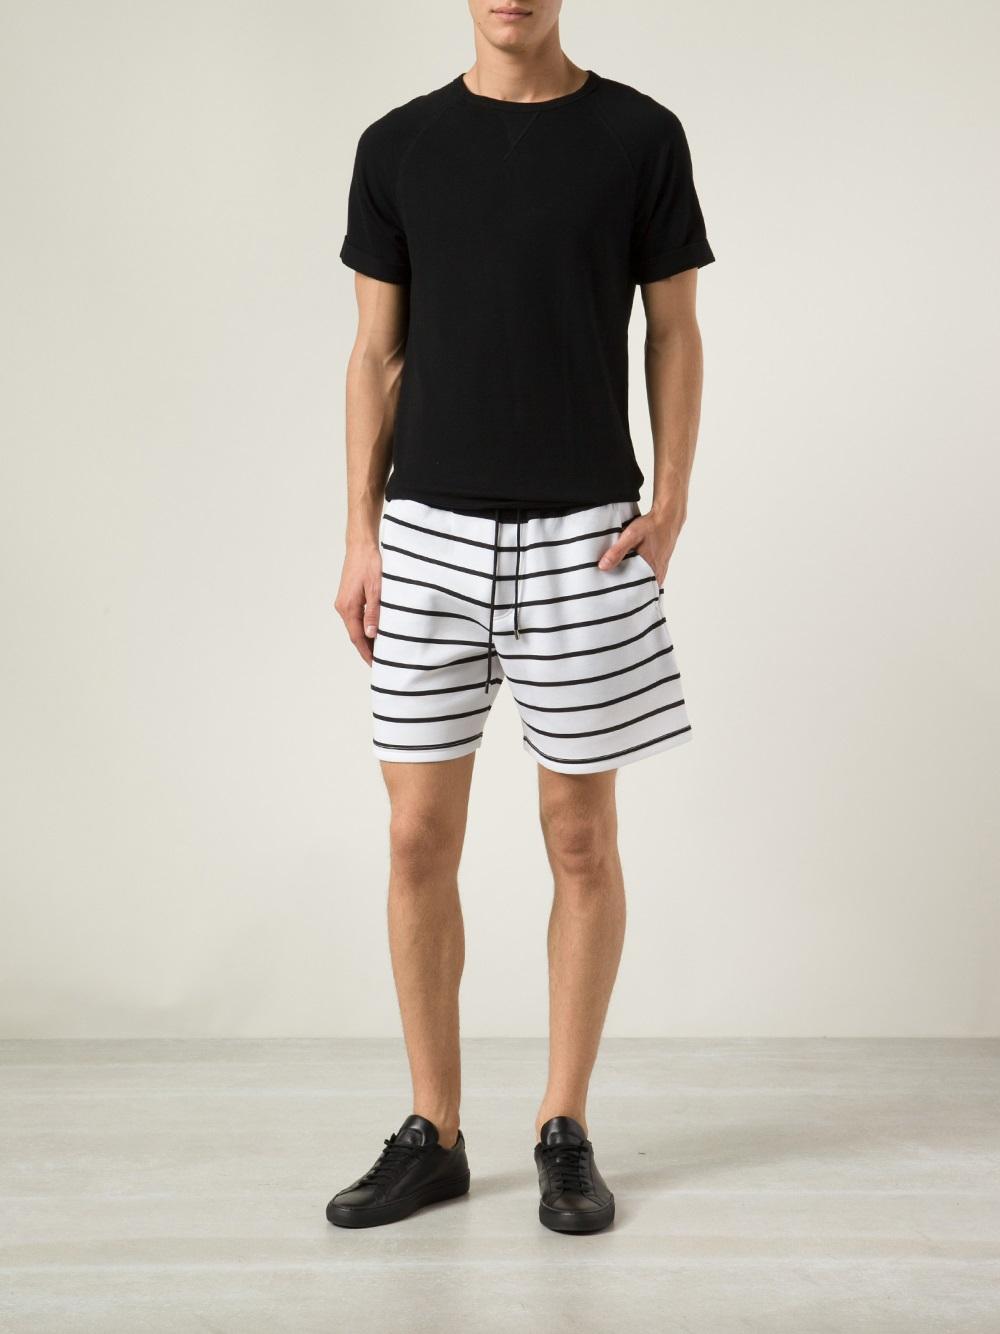 Neil barrett Striped Shorts in Black for Men | Lyst